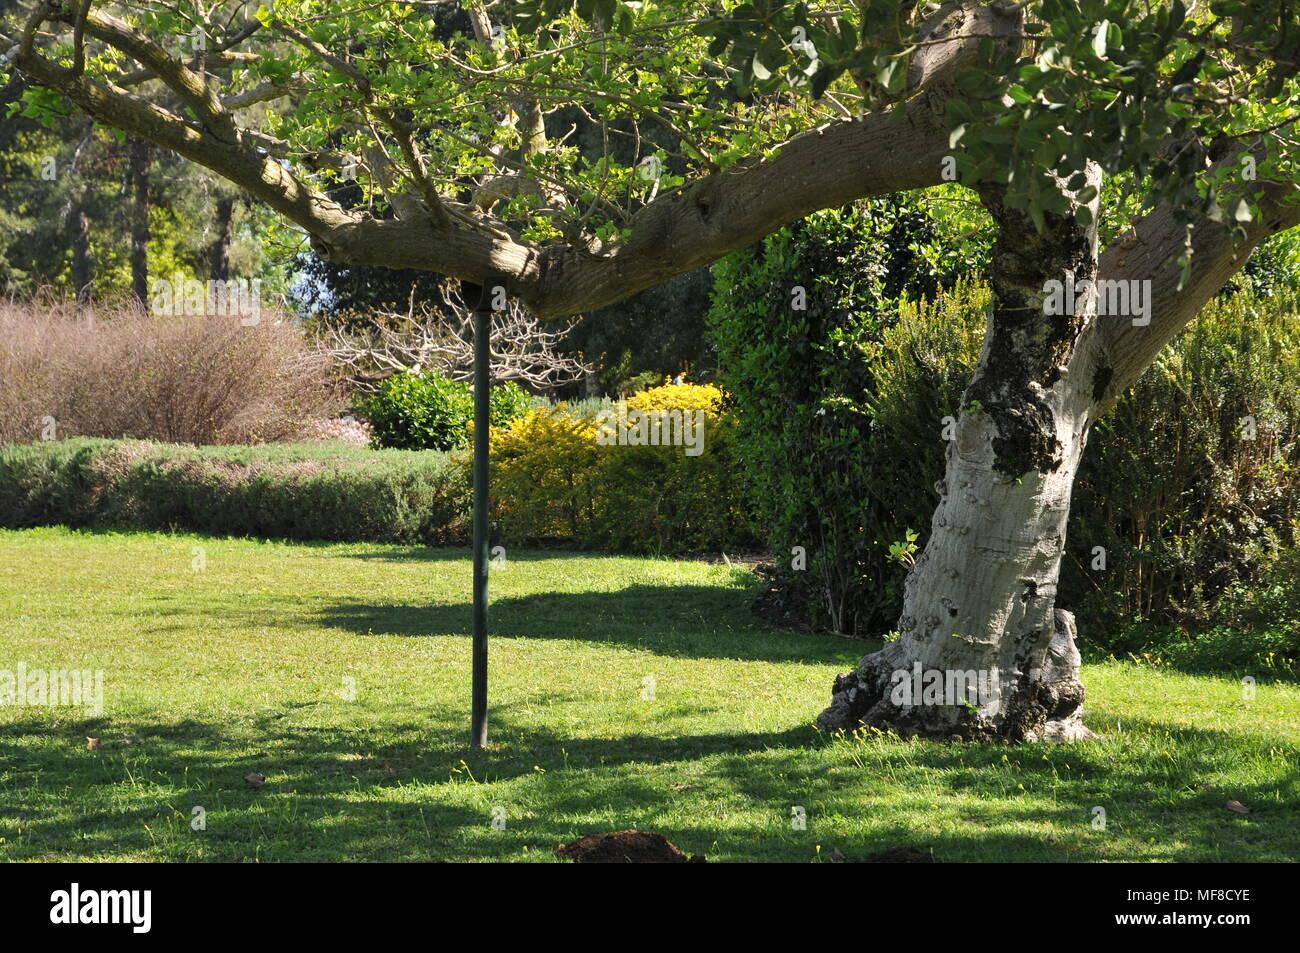 Tree supported by a pole. Photographed at Ramat Hanadiv gardens near Zichron Ya'acov, Mount Carmel, Israel - Stock Image